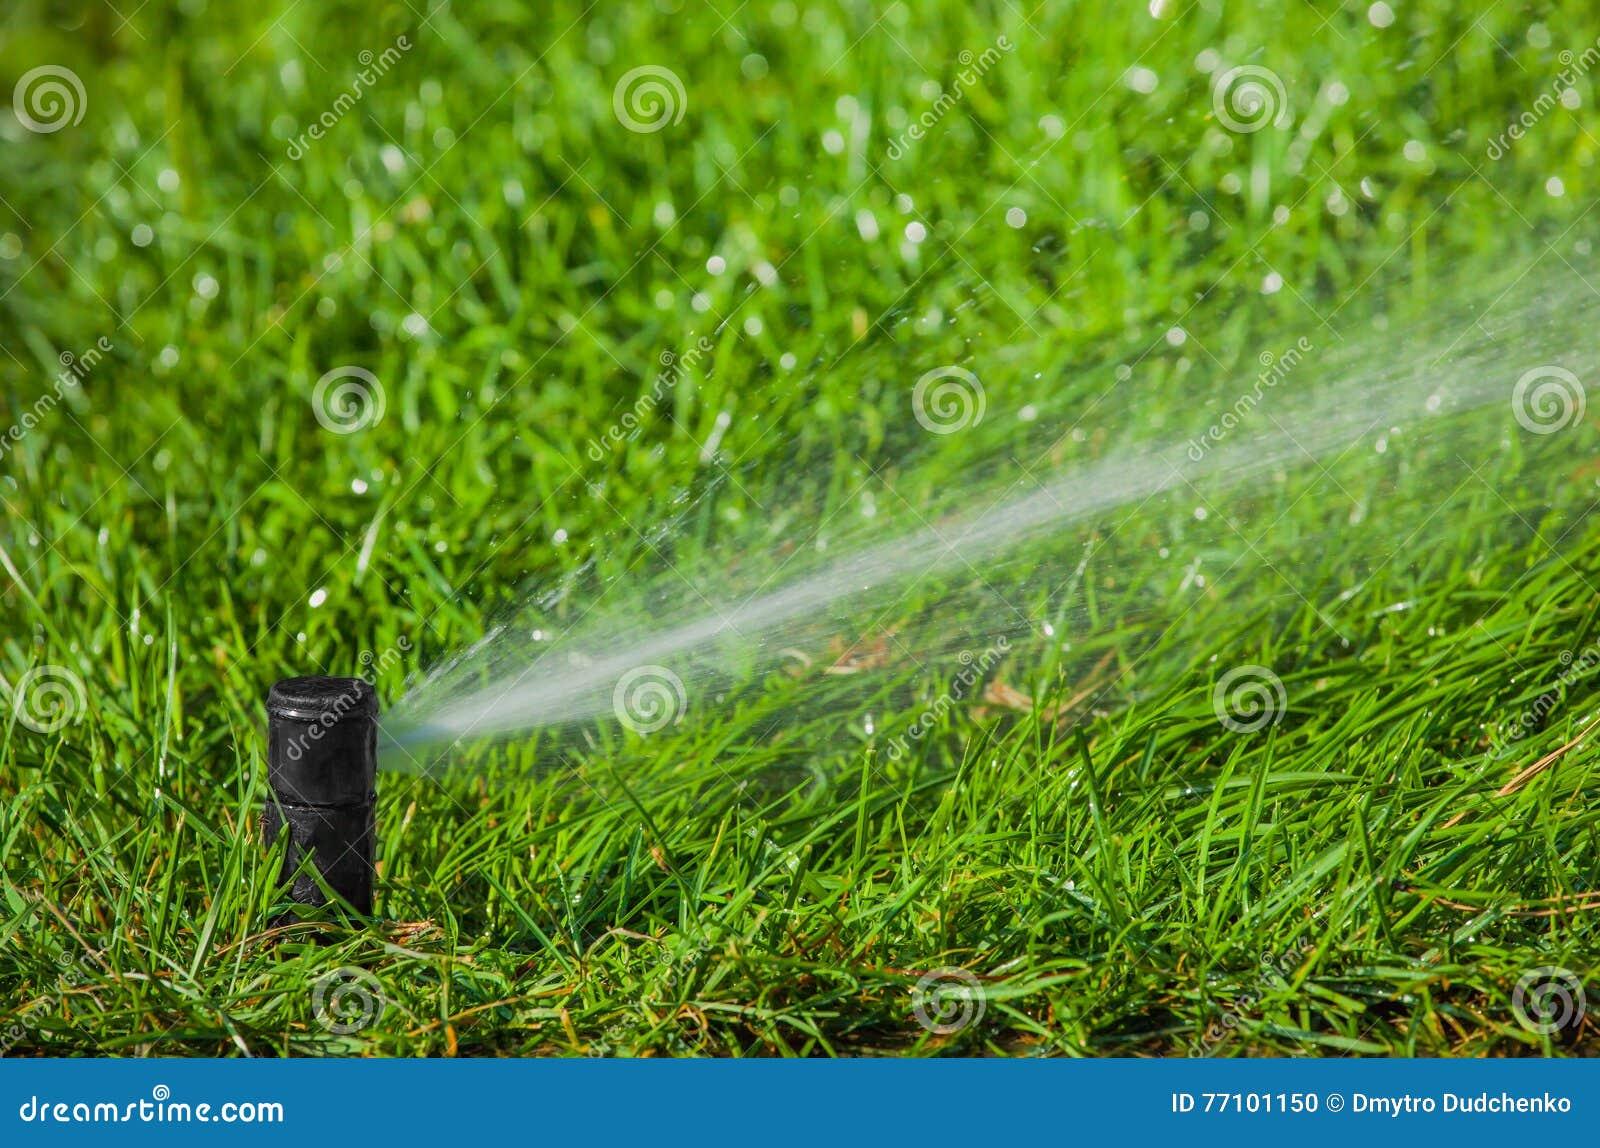 Rasen Bewässerungssystem bewässerungssystem das den rasen wässert stockfoto bild 77101150